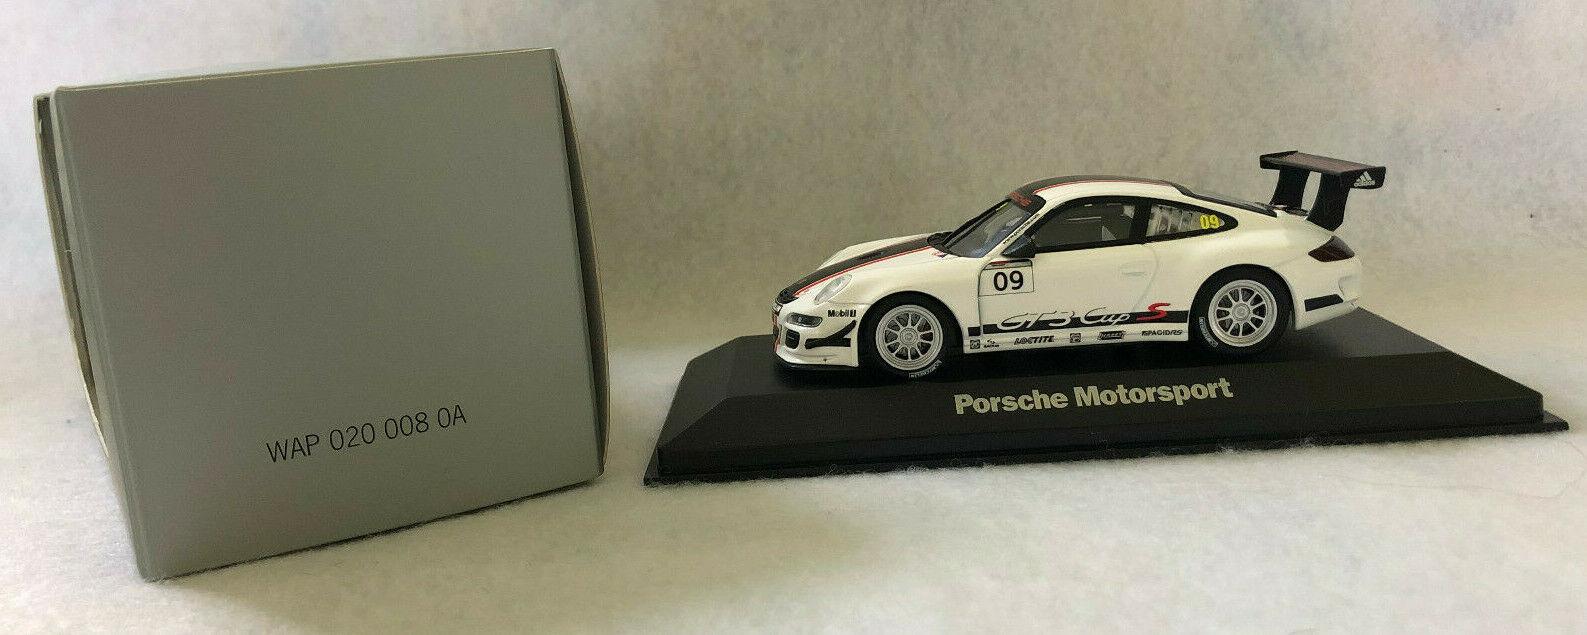 encuentra tu favorito aquí Minichamps Escala 1 43rd Porsche Porsche Porsche 911 GT3 Cup S,  09, Porsche Motorsport, blancoo  connotación de lujo discreta